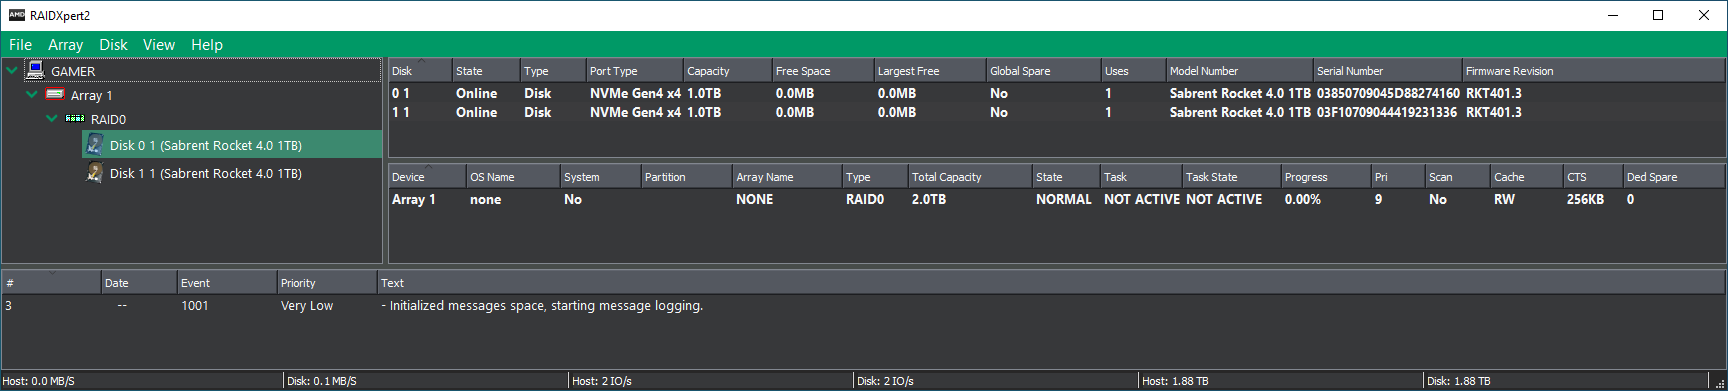 RAIDXpert2.PNG